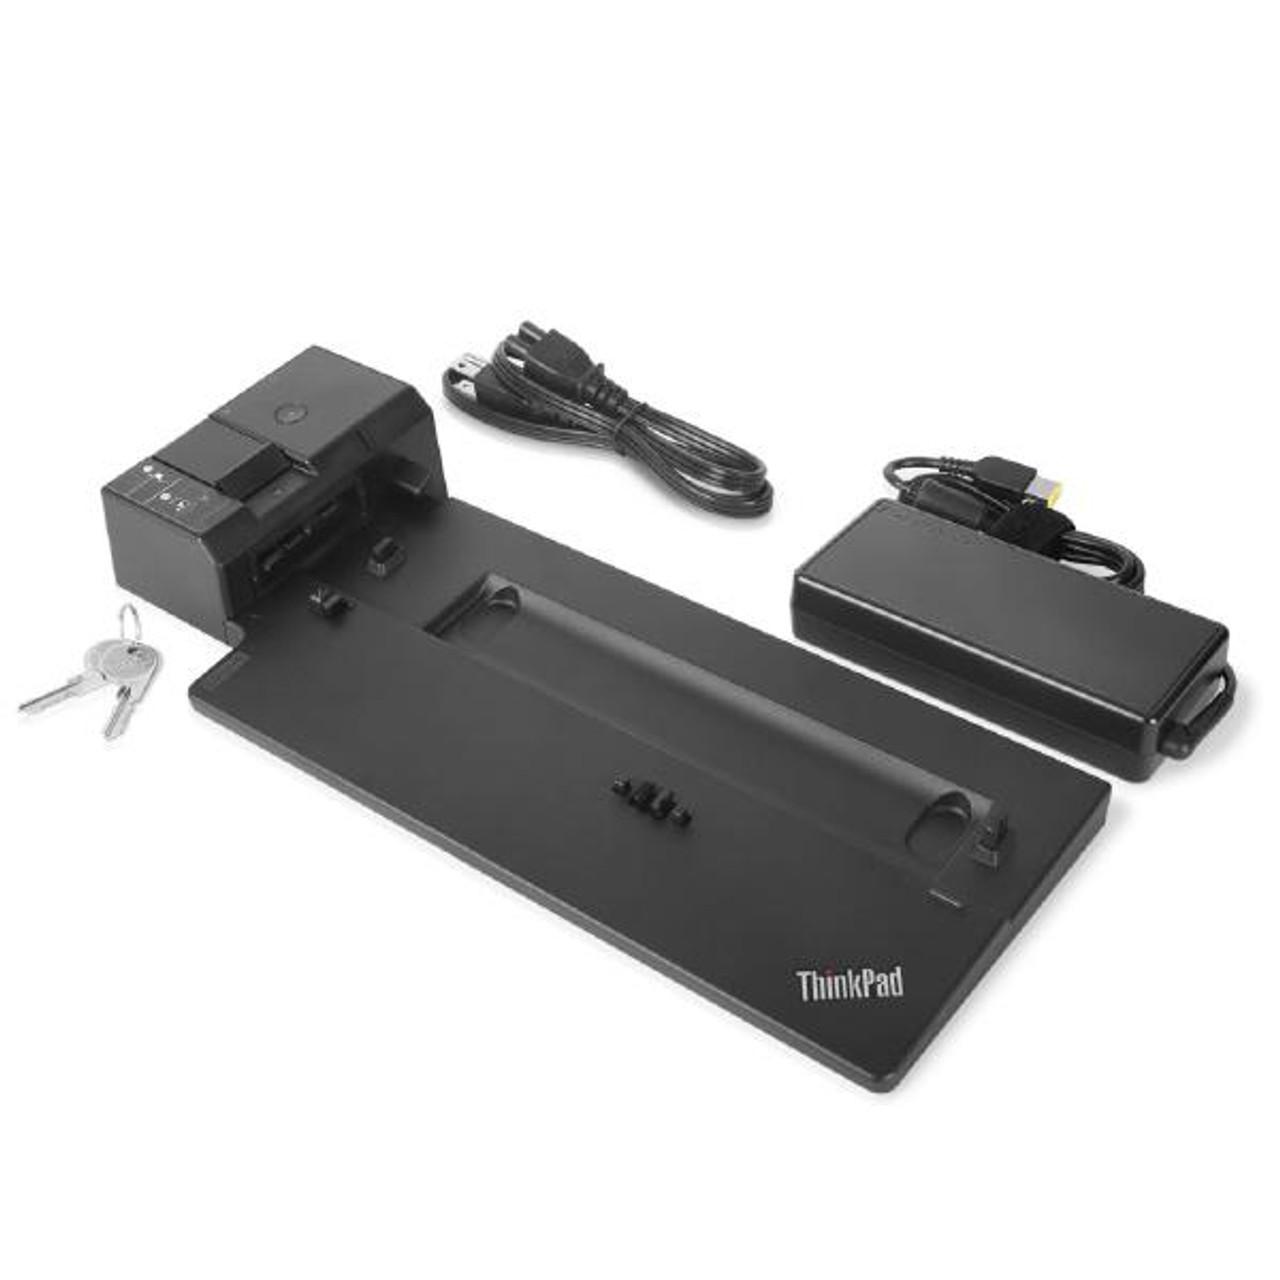 Lenovo ThinkPad Ultra Docking Station 40AJ0135AU (Suits L480, L580,  P52s,T480, R480s,T580, X1 Carbon G6, X280 Series)